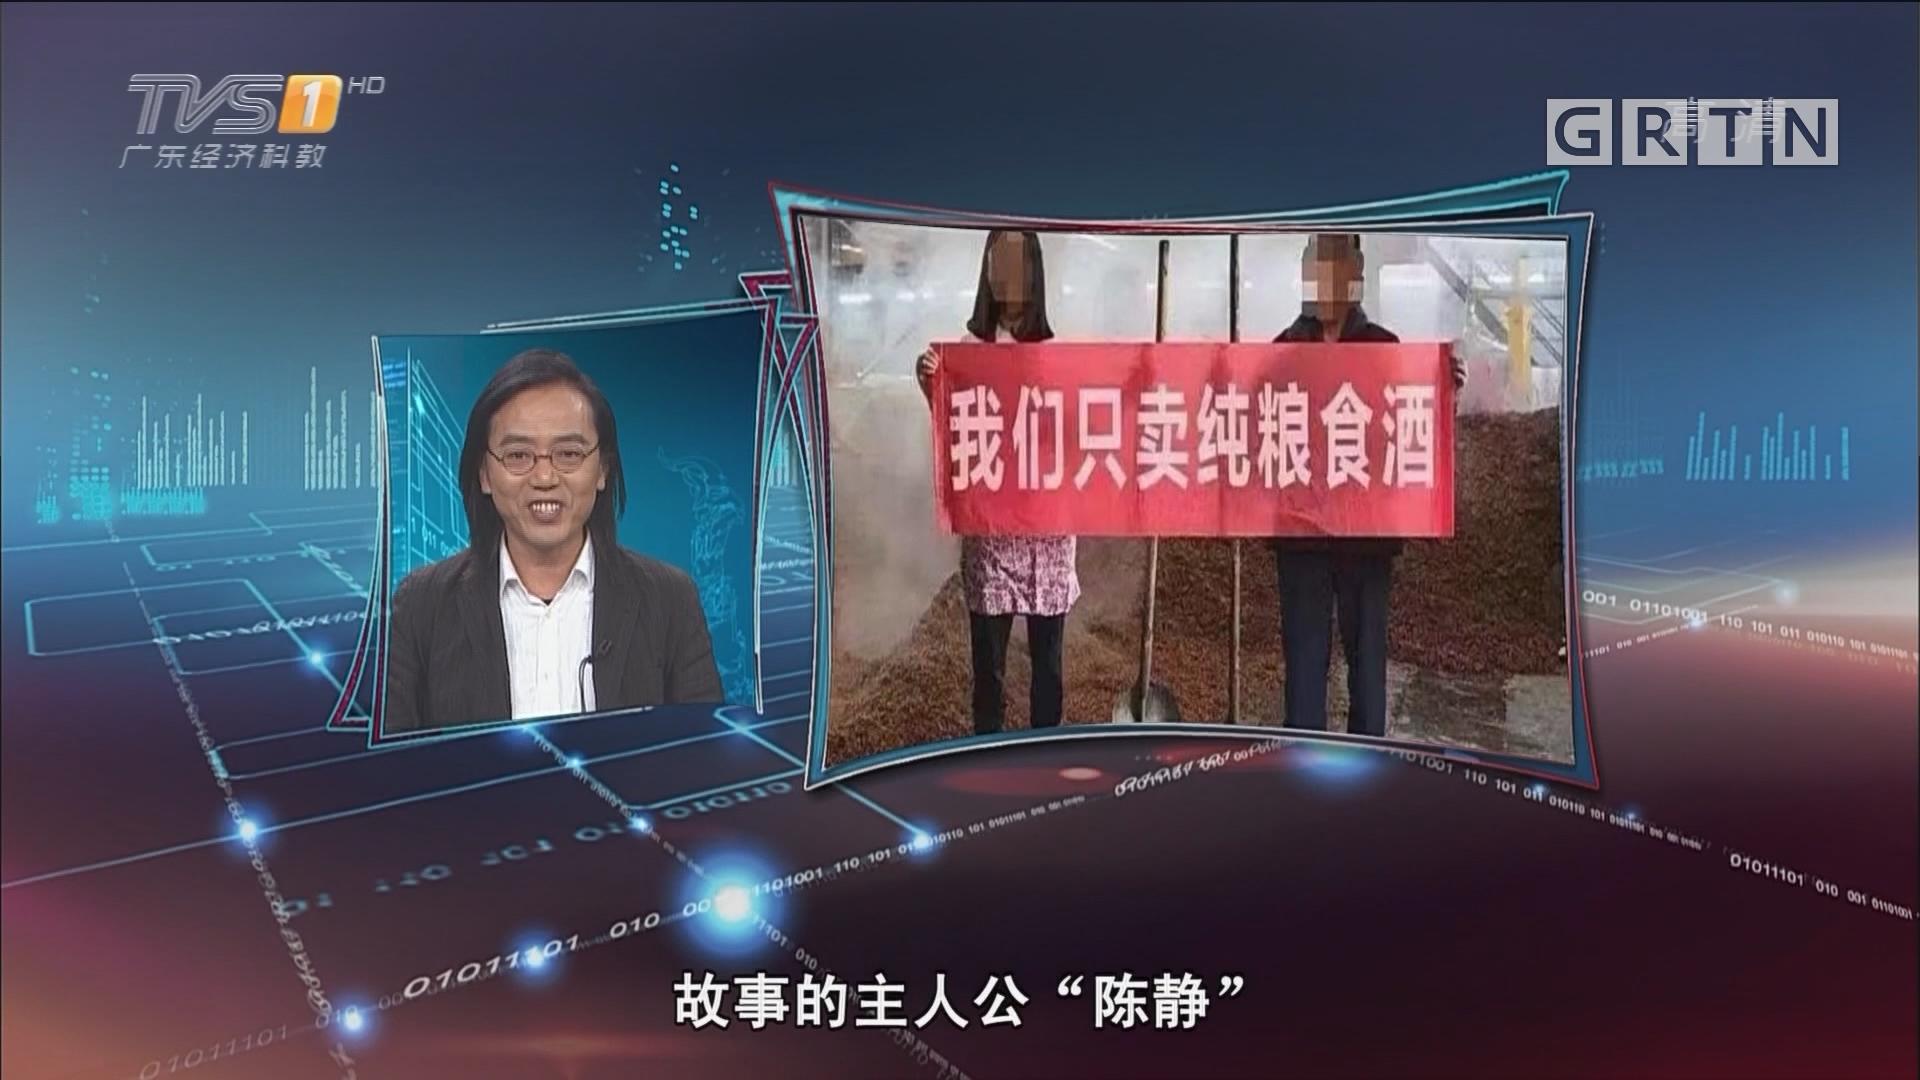 [HD][2018-12-24]马后炮:网络虚假营销,罚酒三杯力度不够